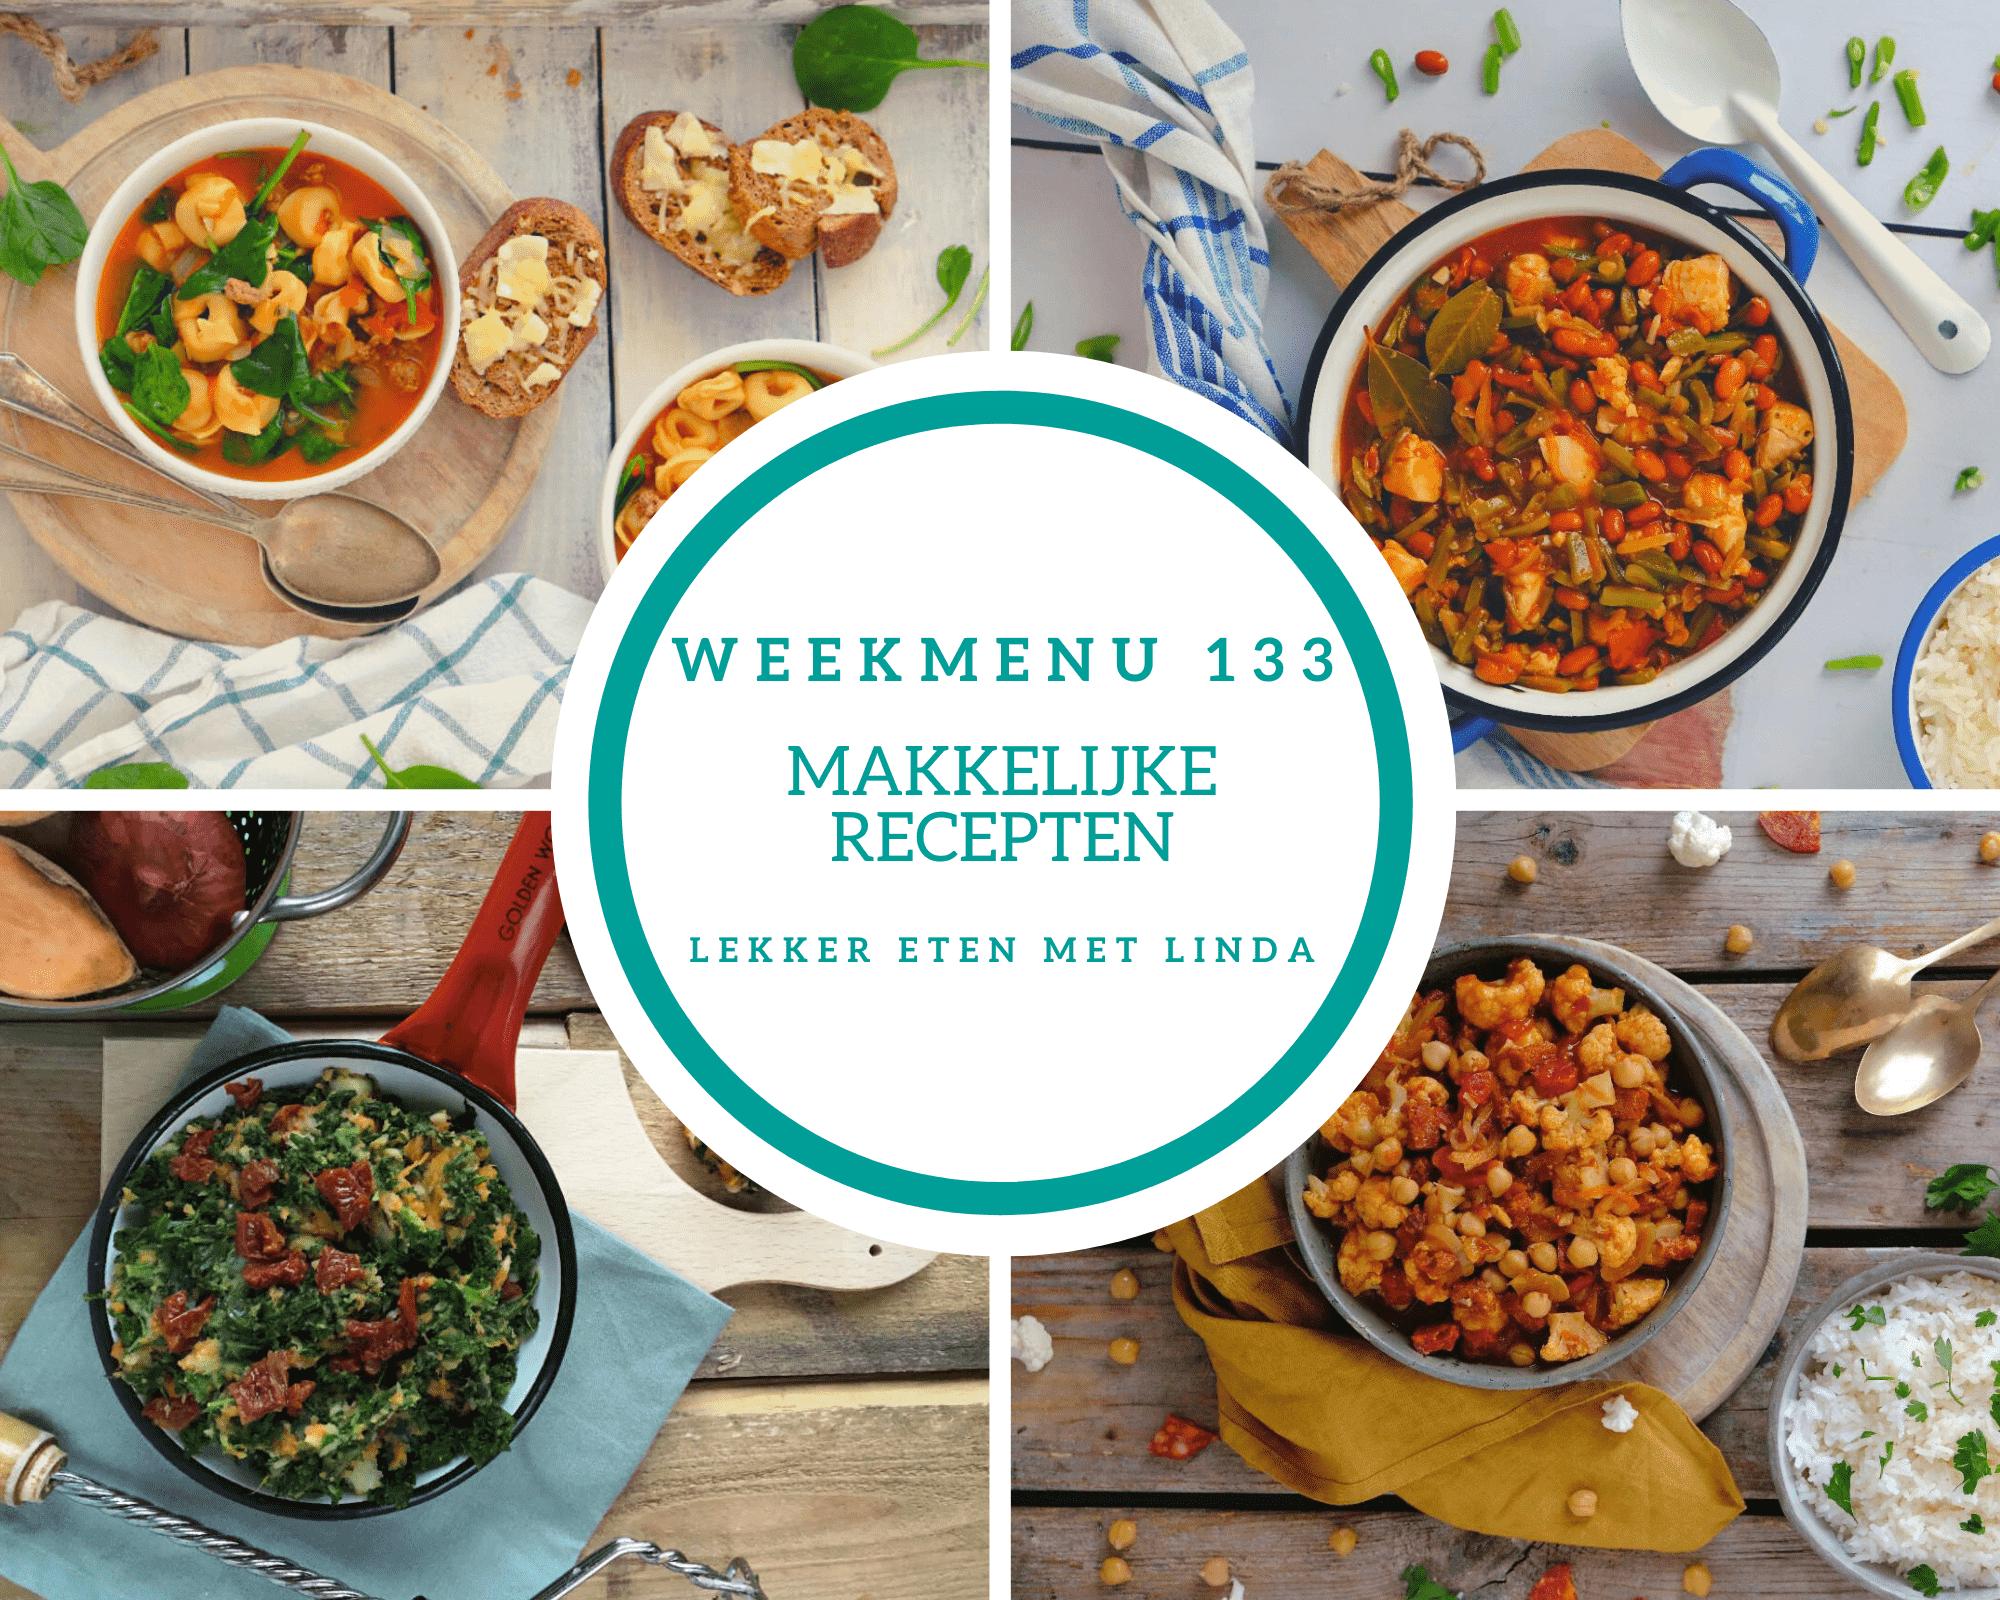 Weekmenu 133 makkelijke recepten